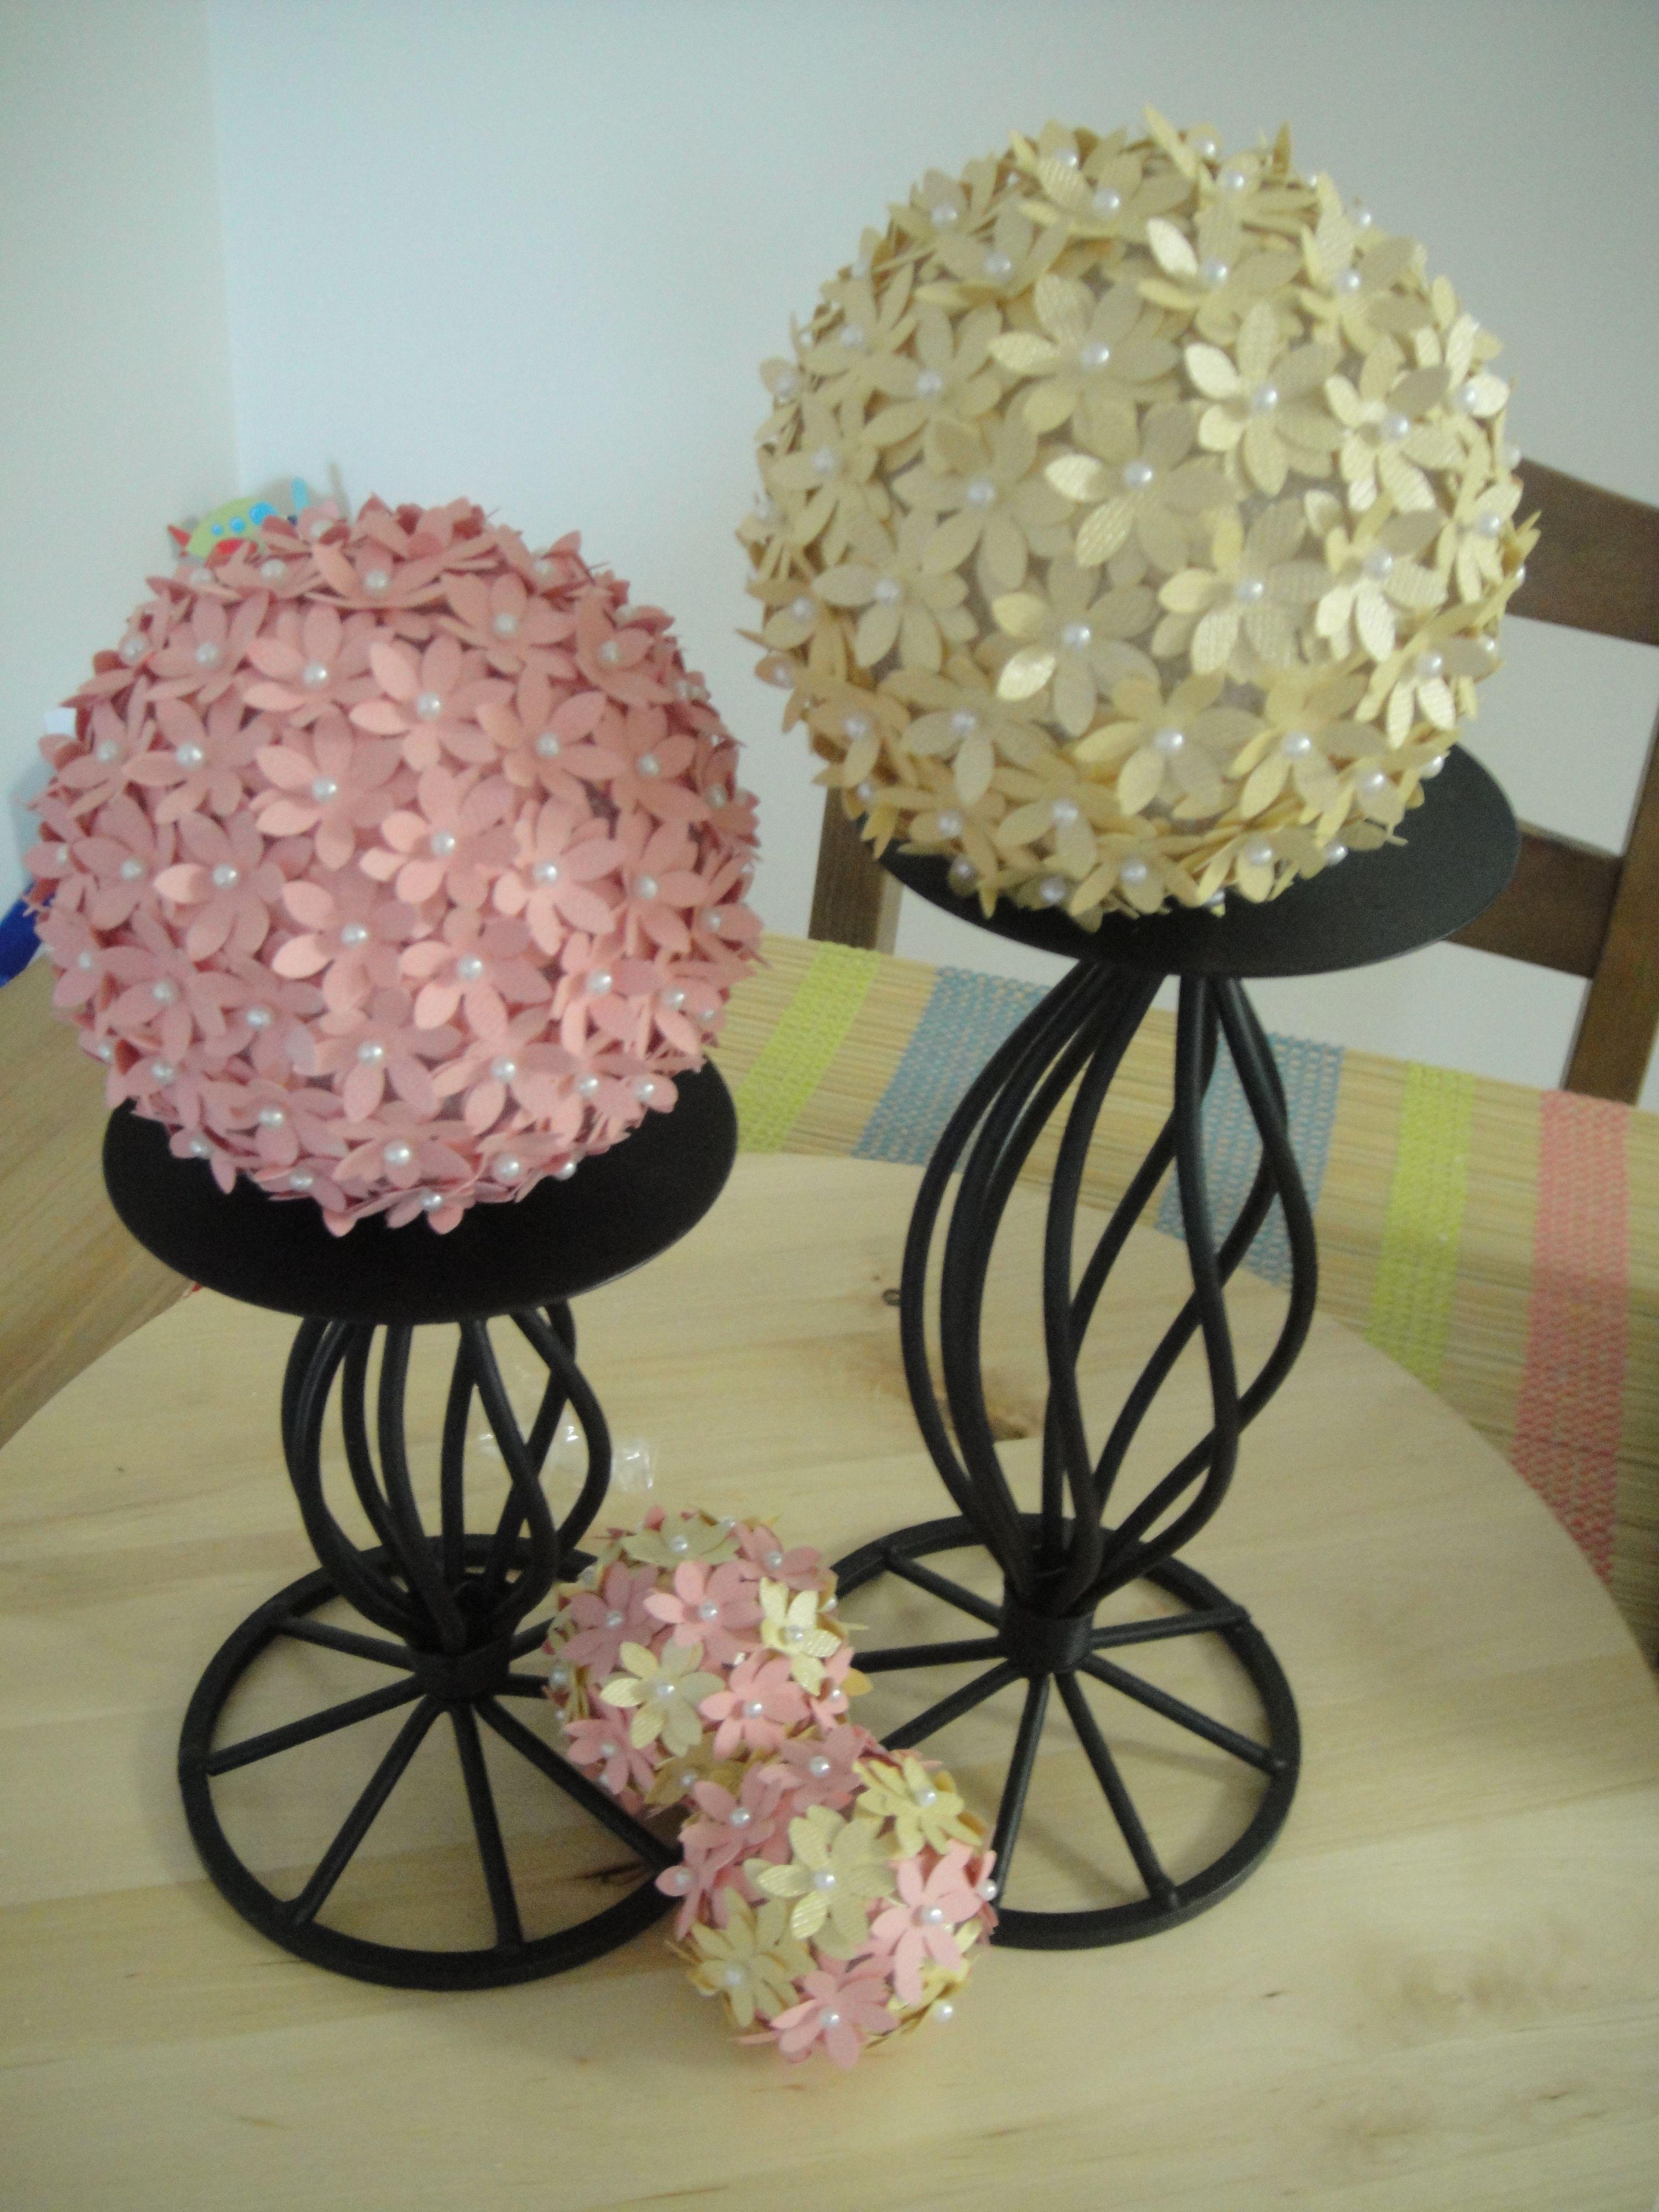 DIY decorative balls I made. Dollar tree diy crafts